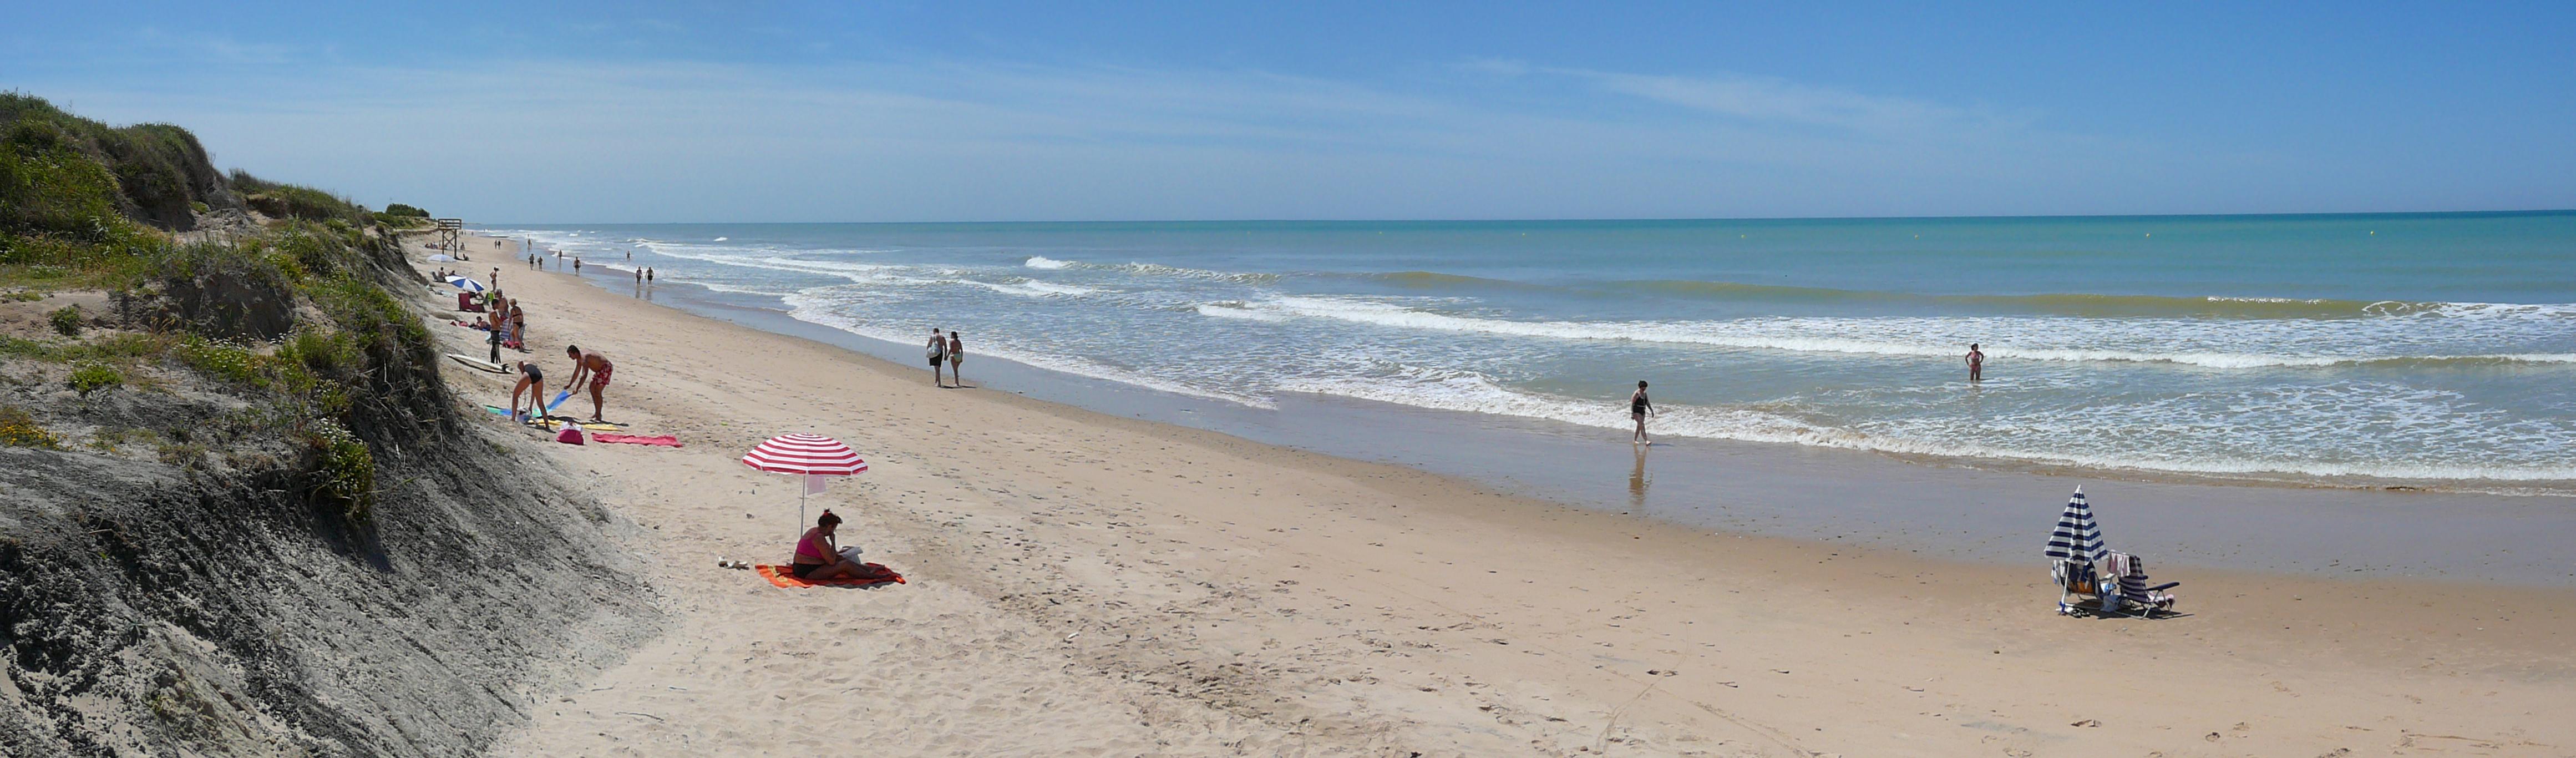 Playa Aguadulce / Peginas